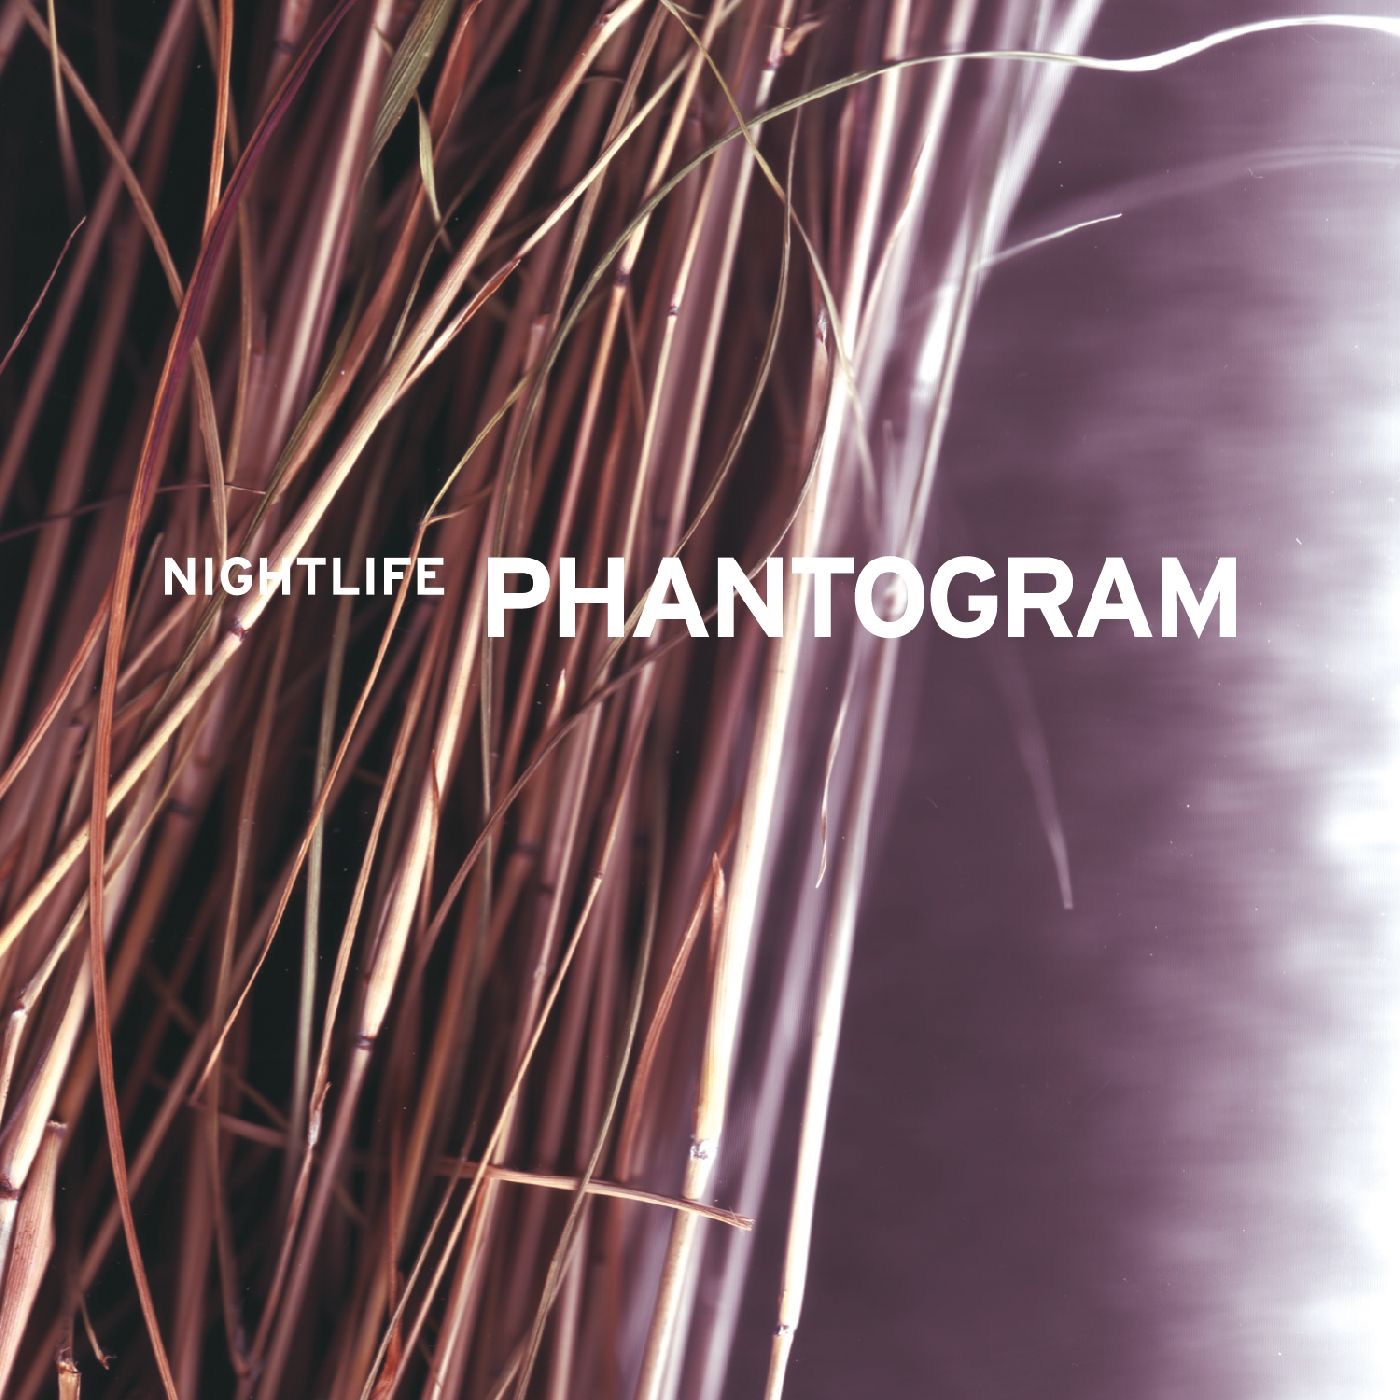 Phantogram album Nightlife - EP